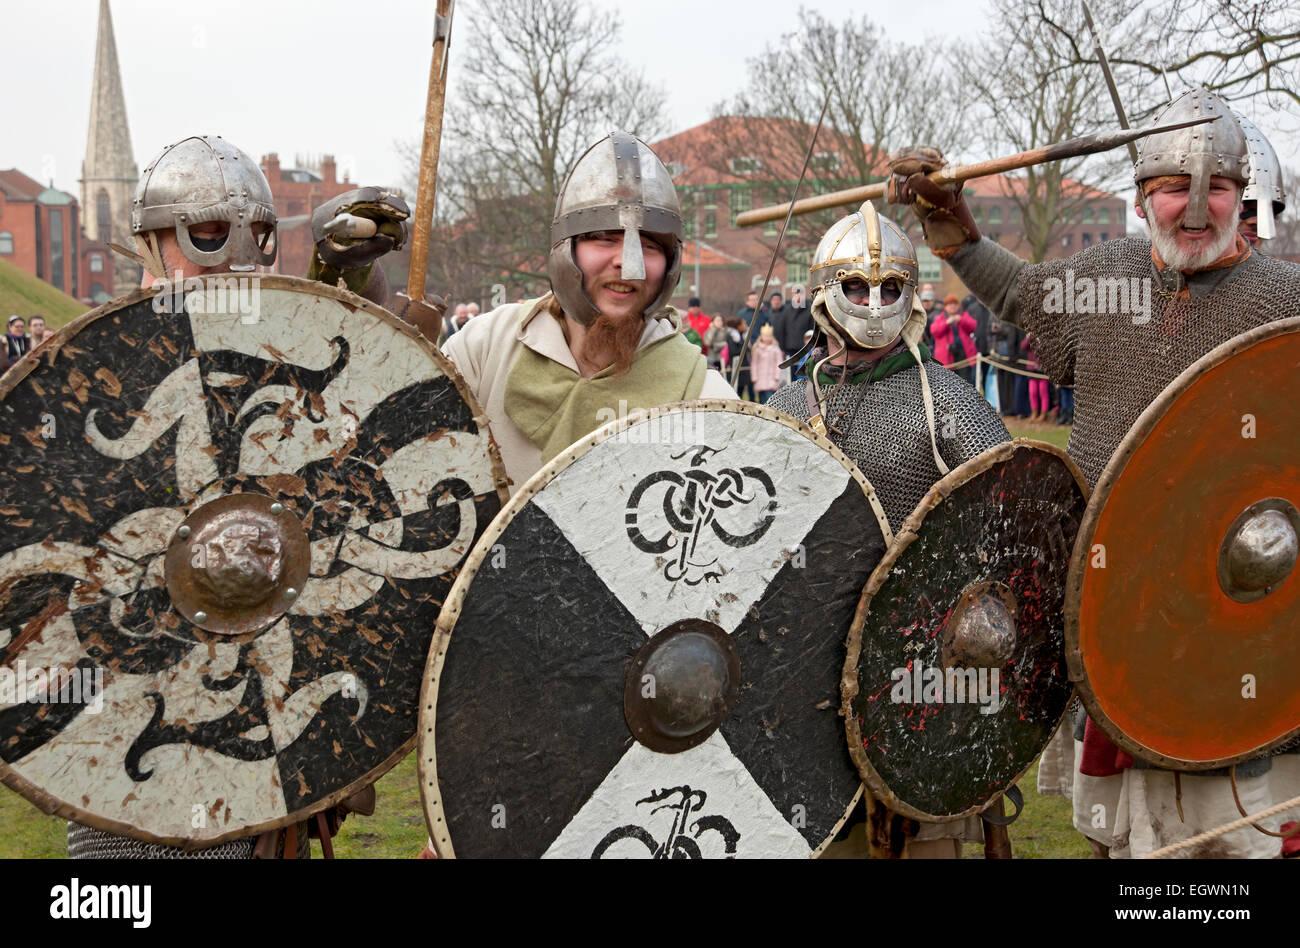 Vikings and Anglo Saxons at the Viking Festival York North Yorkshire England UK United Kingdom GB Great Britain - Stock Image